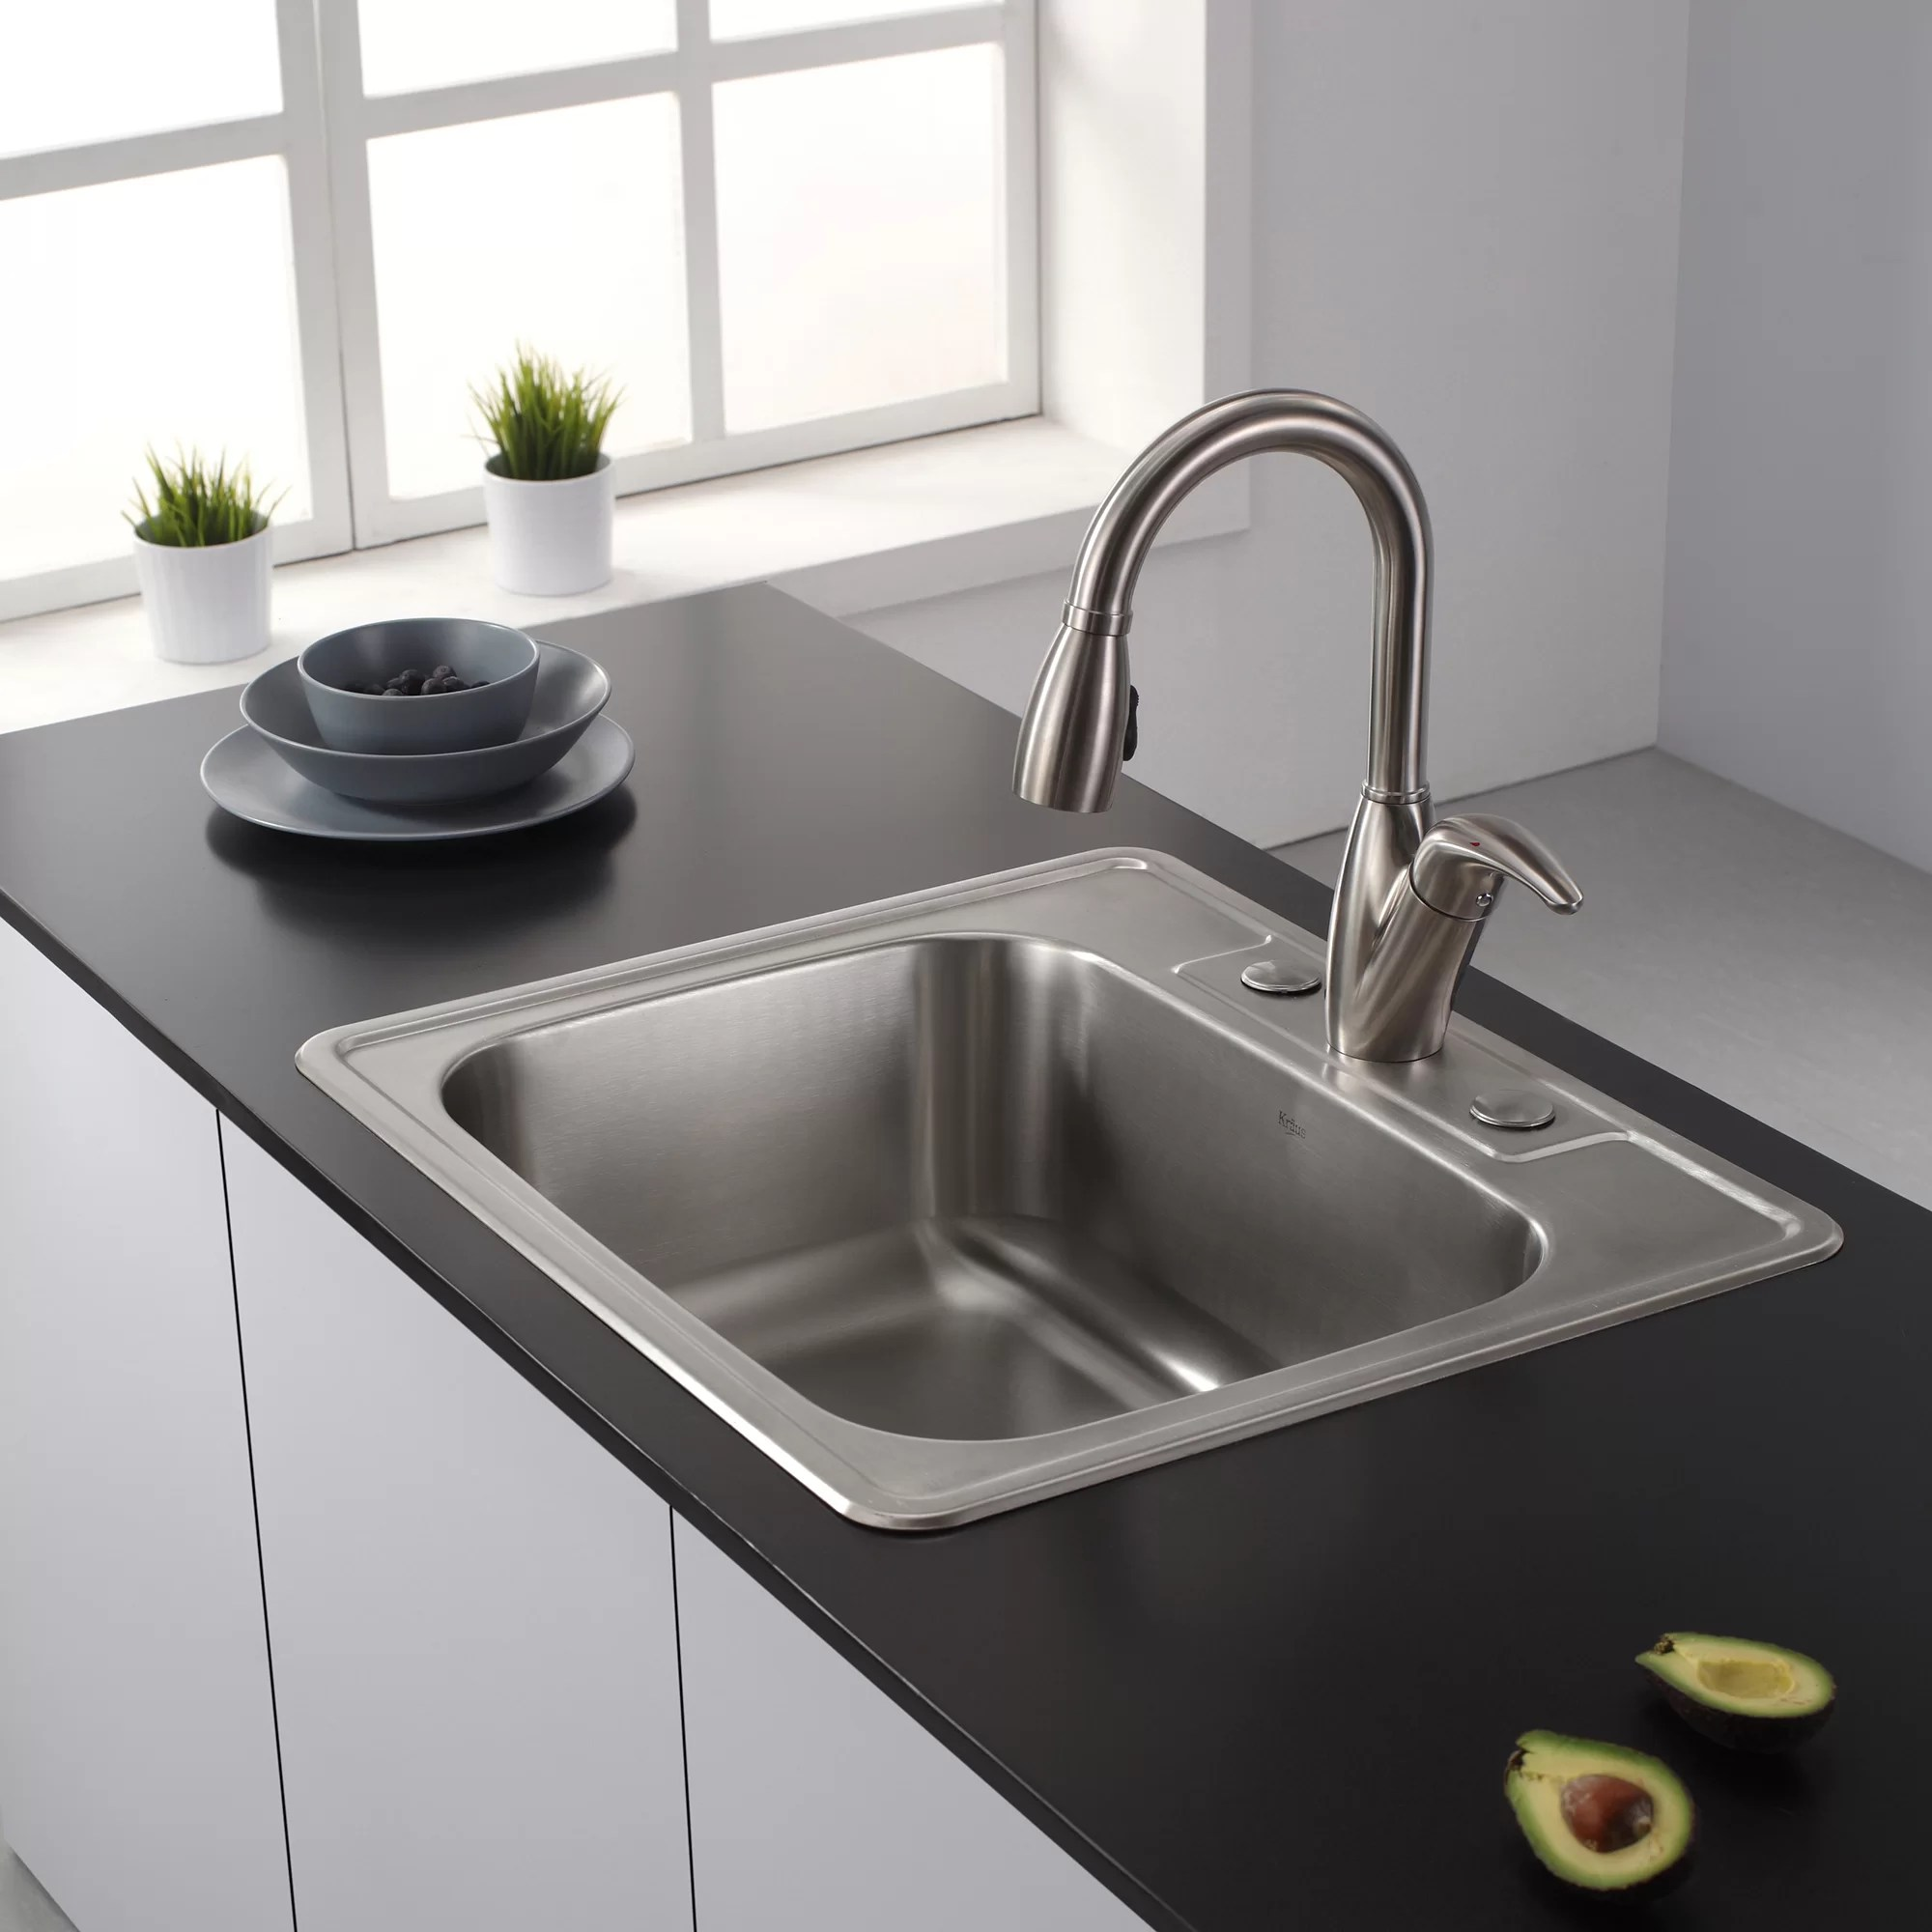 25 l x 22 w drop in kitchen sink